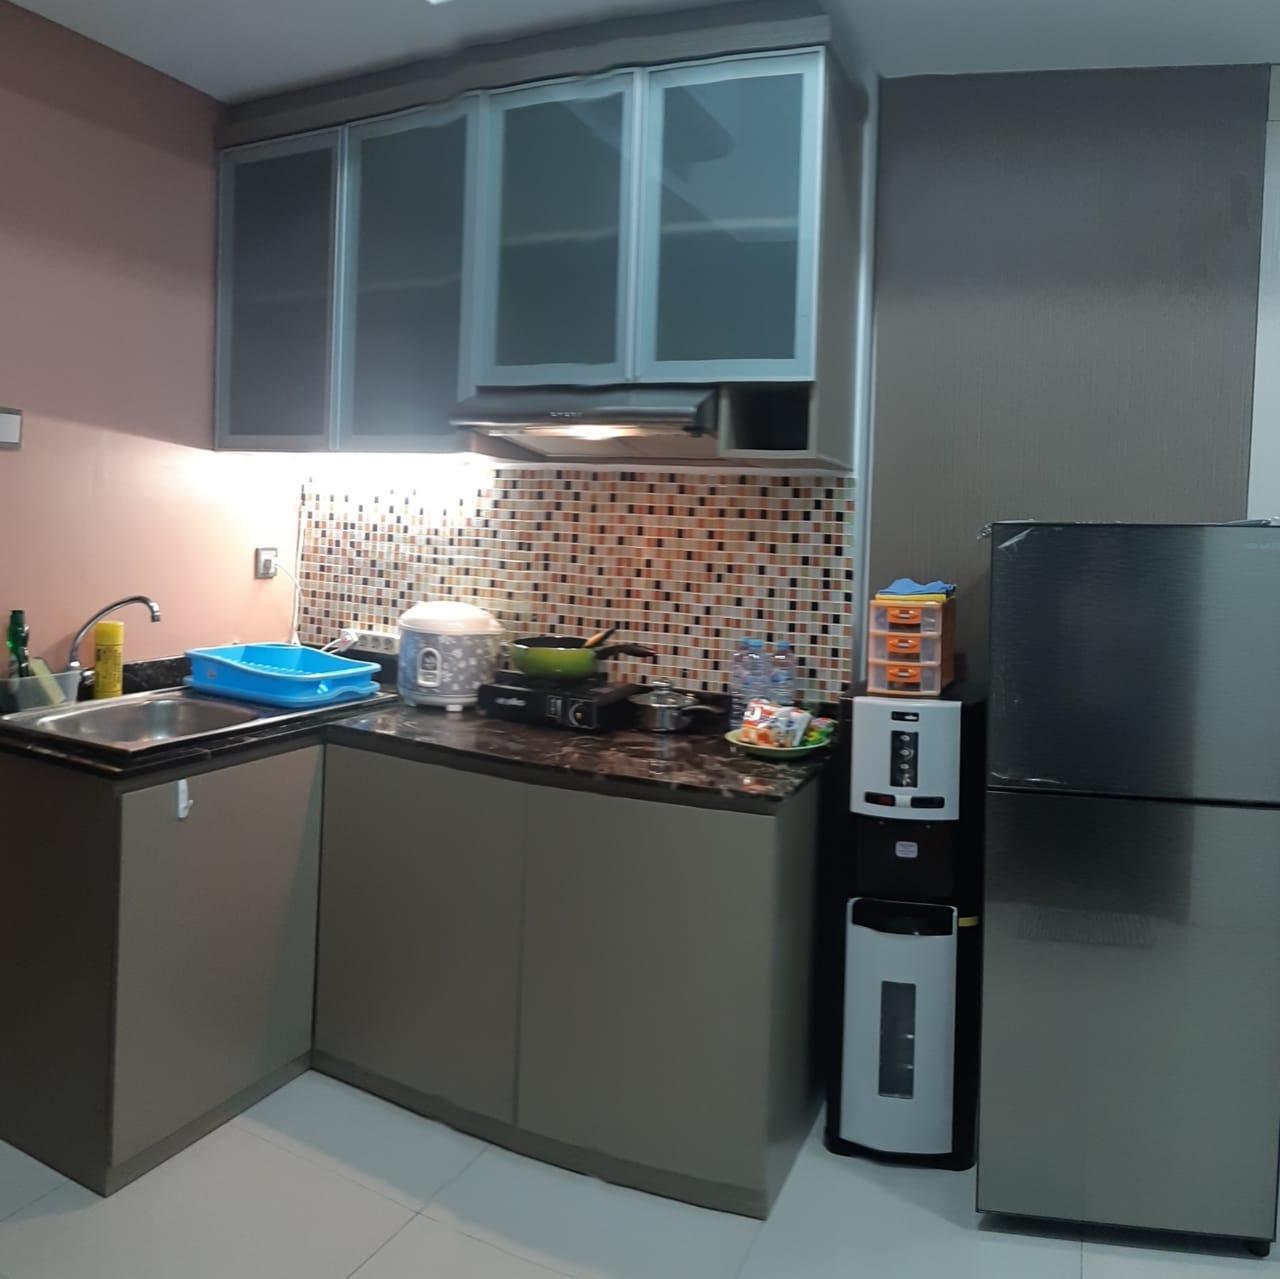 Nora Home 2br Apartemen At Central Surabaya